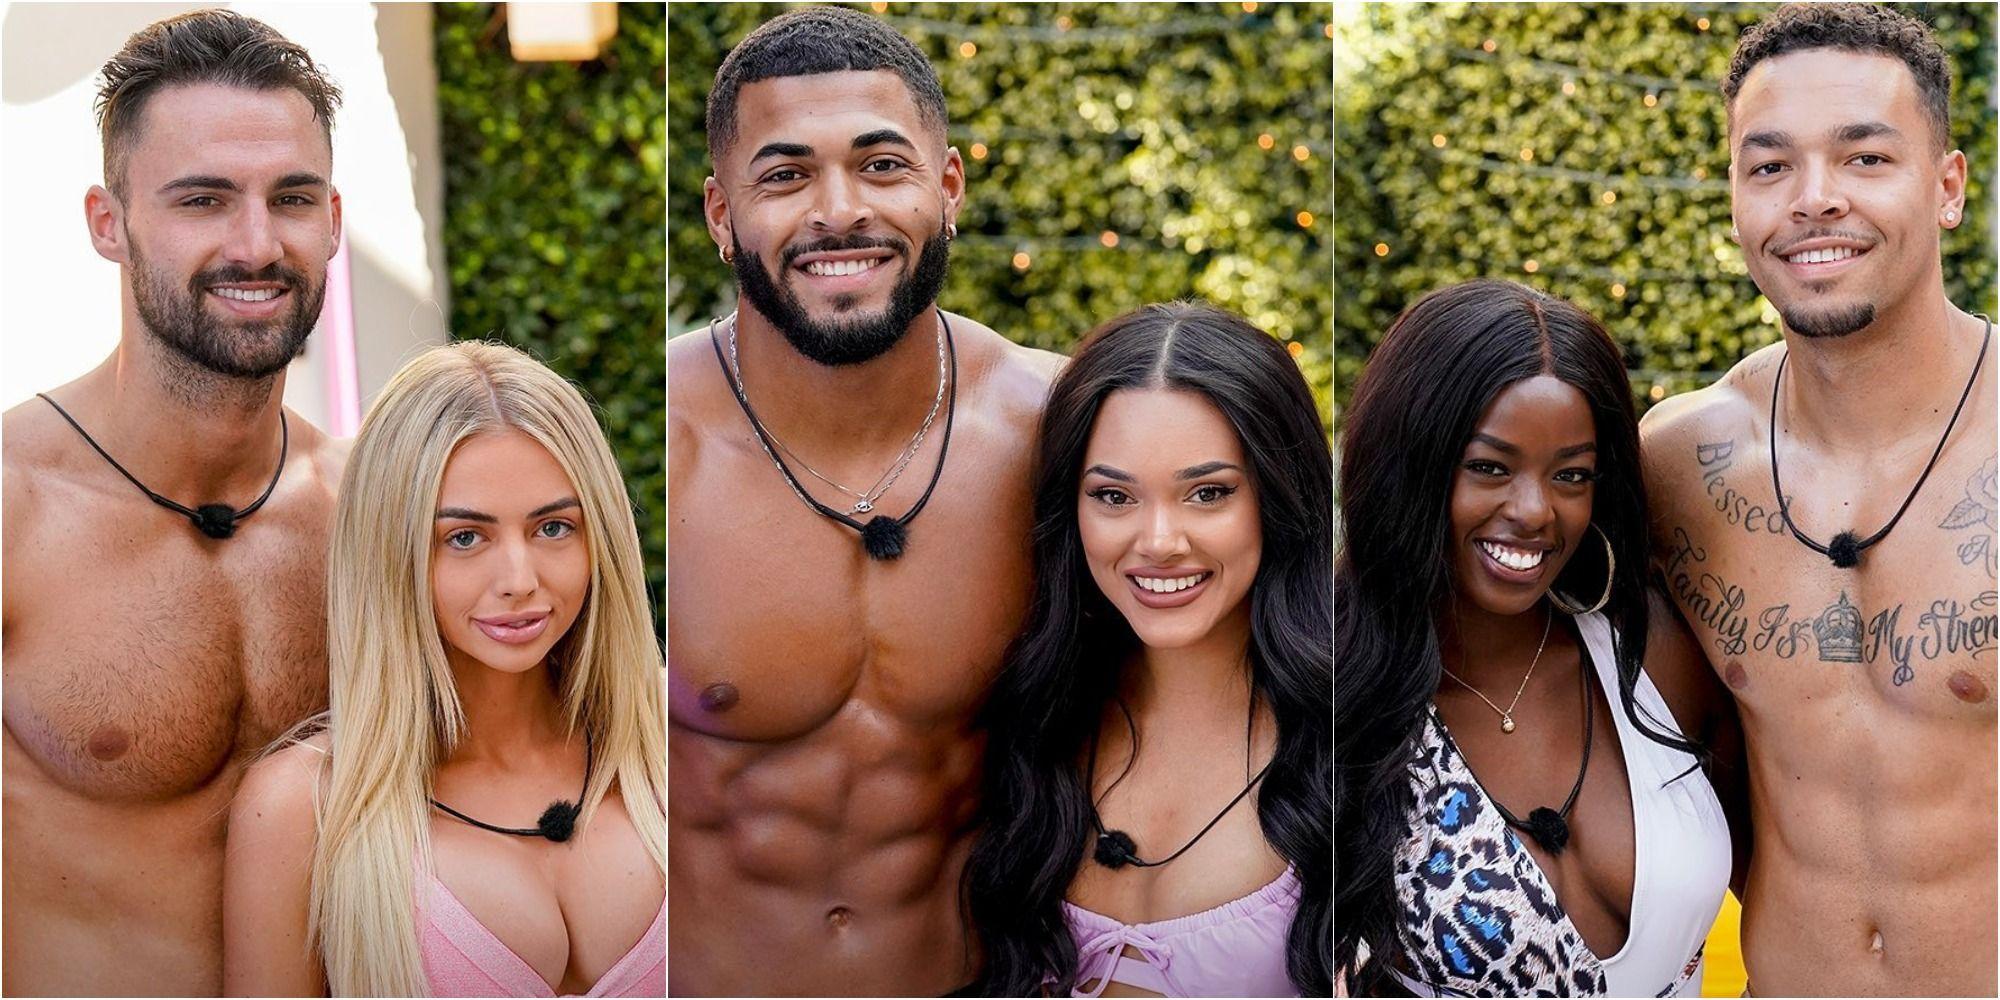 Love Island USA: Season 2 Episode 11 TV Schedule, Streaming Options & Recap  - Mimicnews